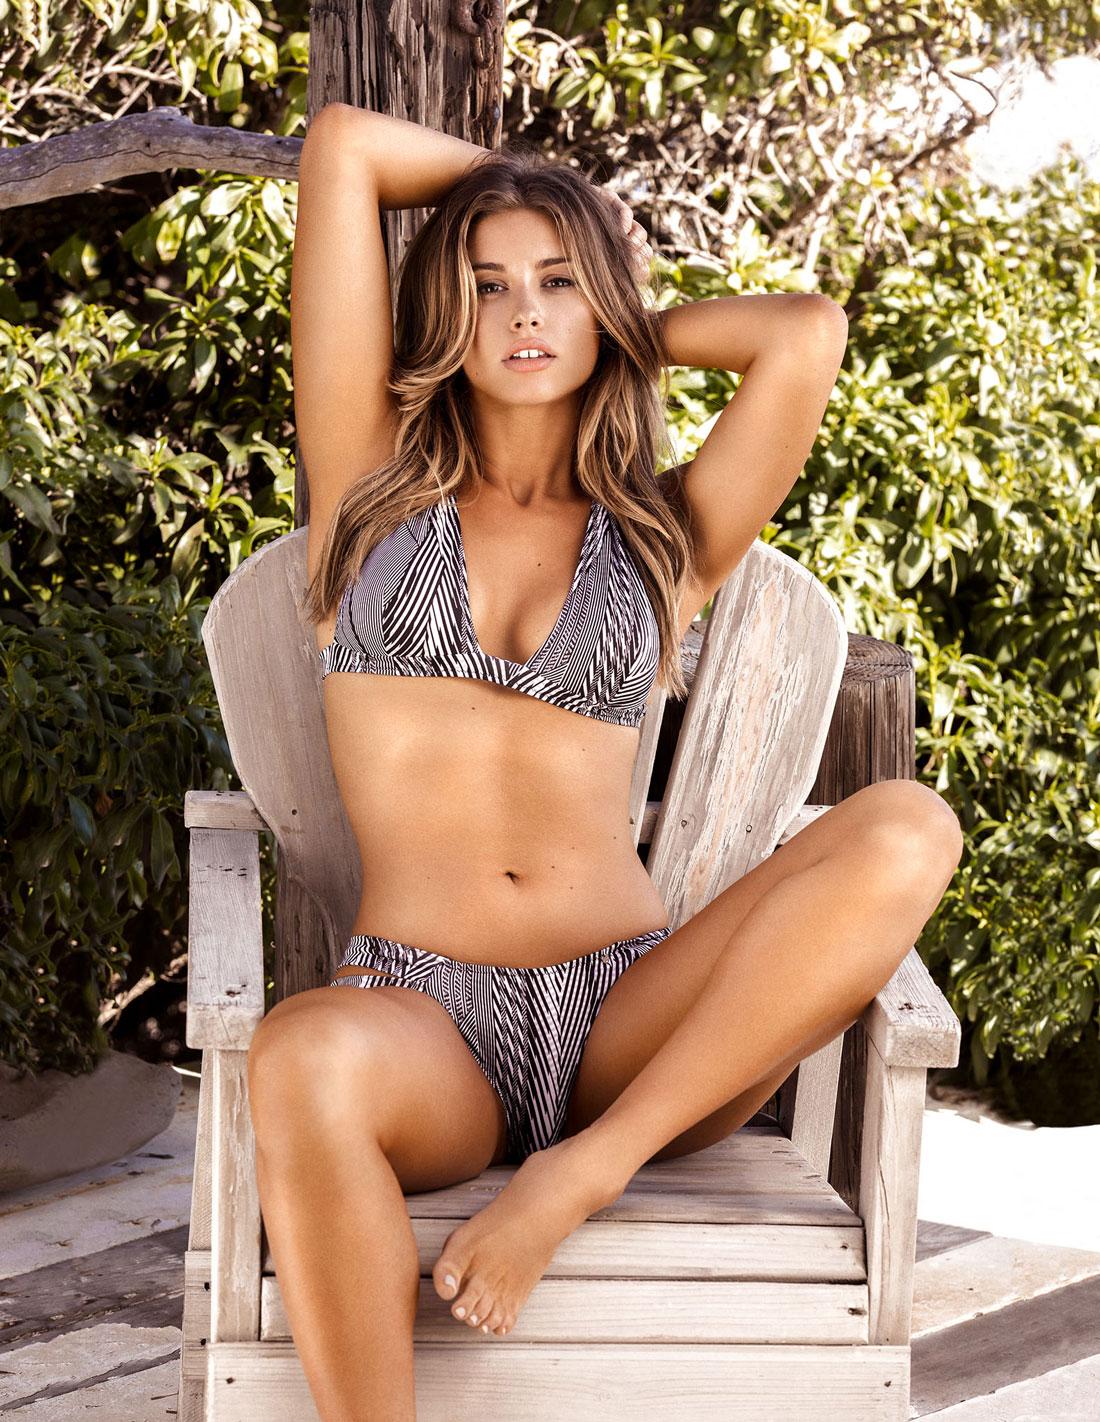 foto Elsie hewitt guess lingerie summer 2019 by alessandra fiorini hq photo shoot